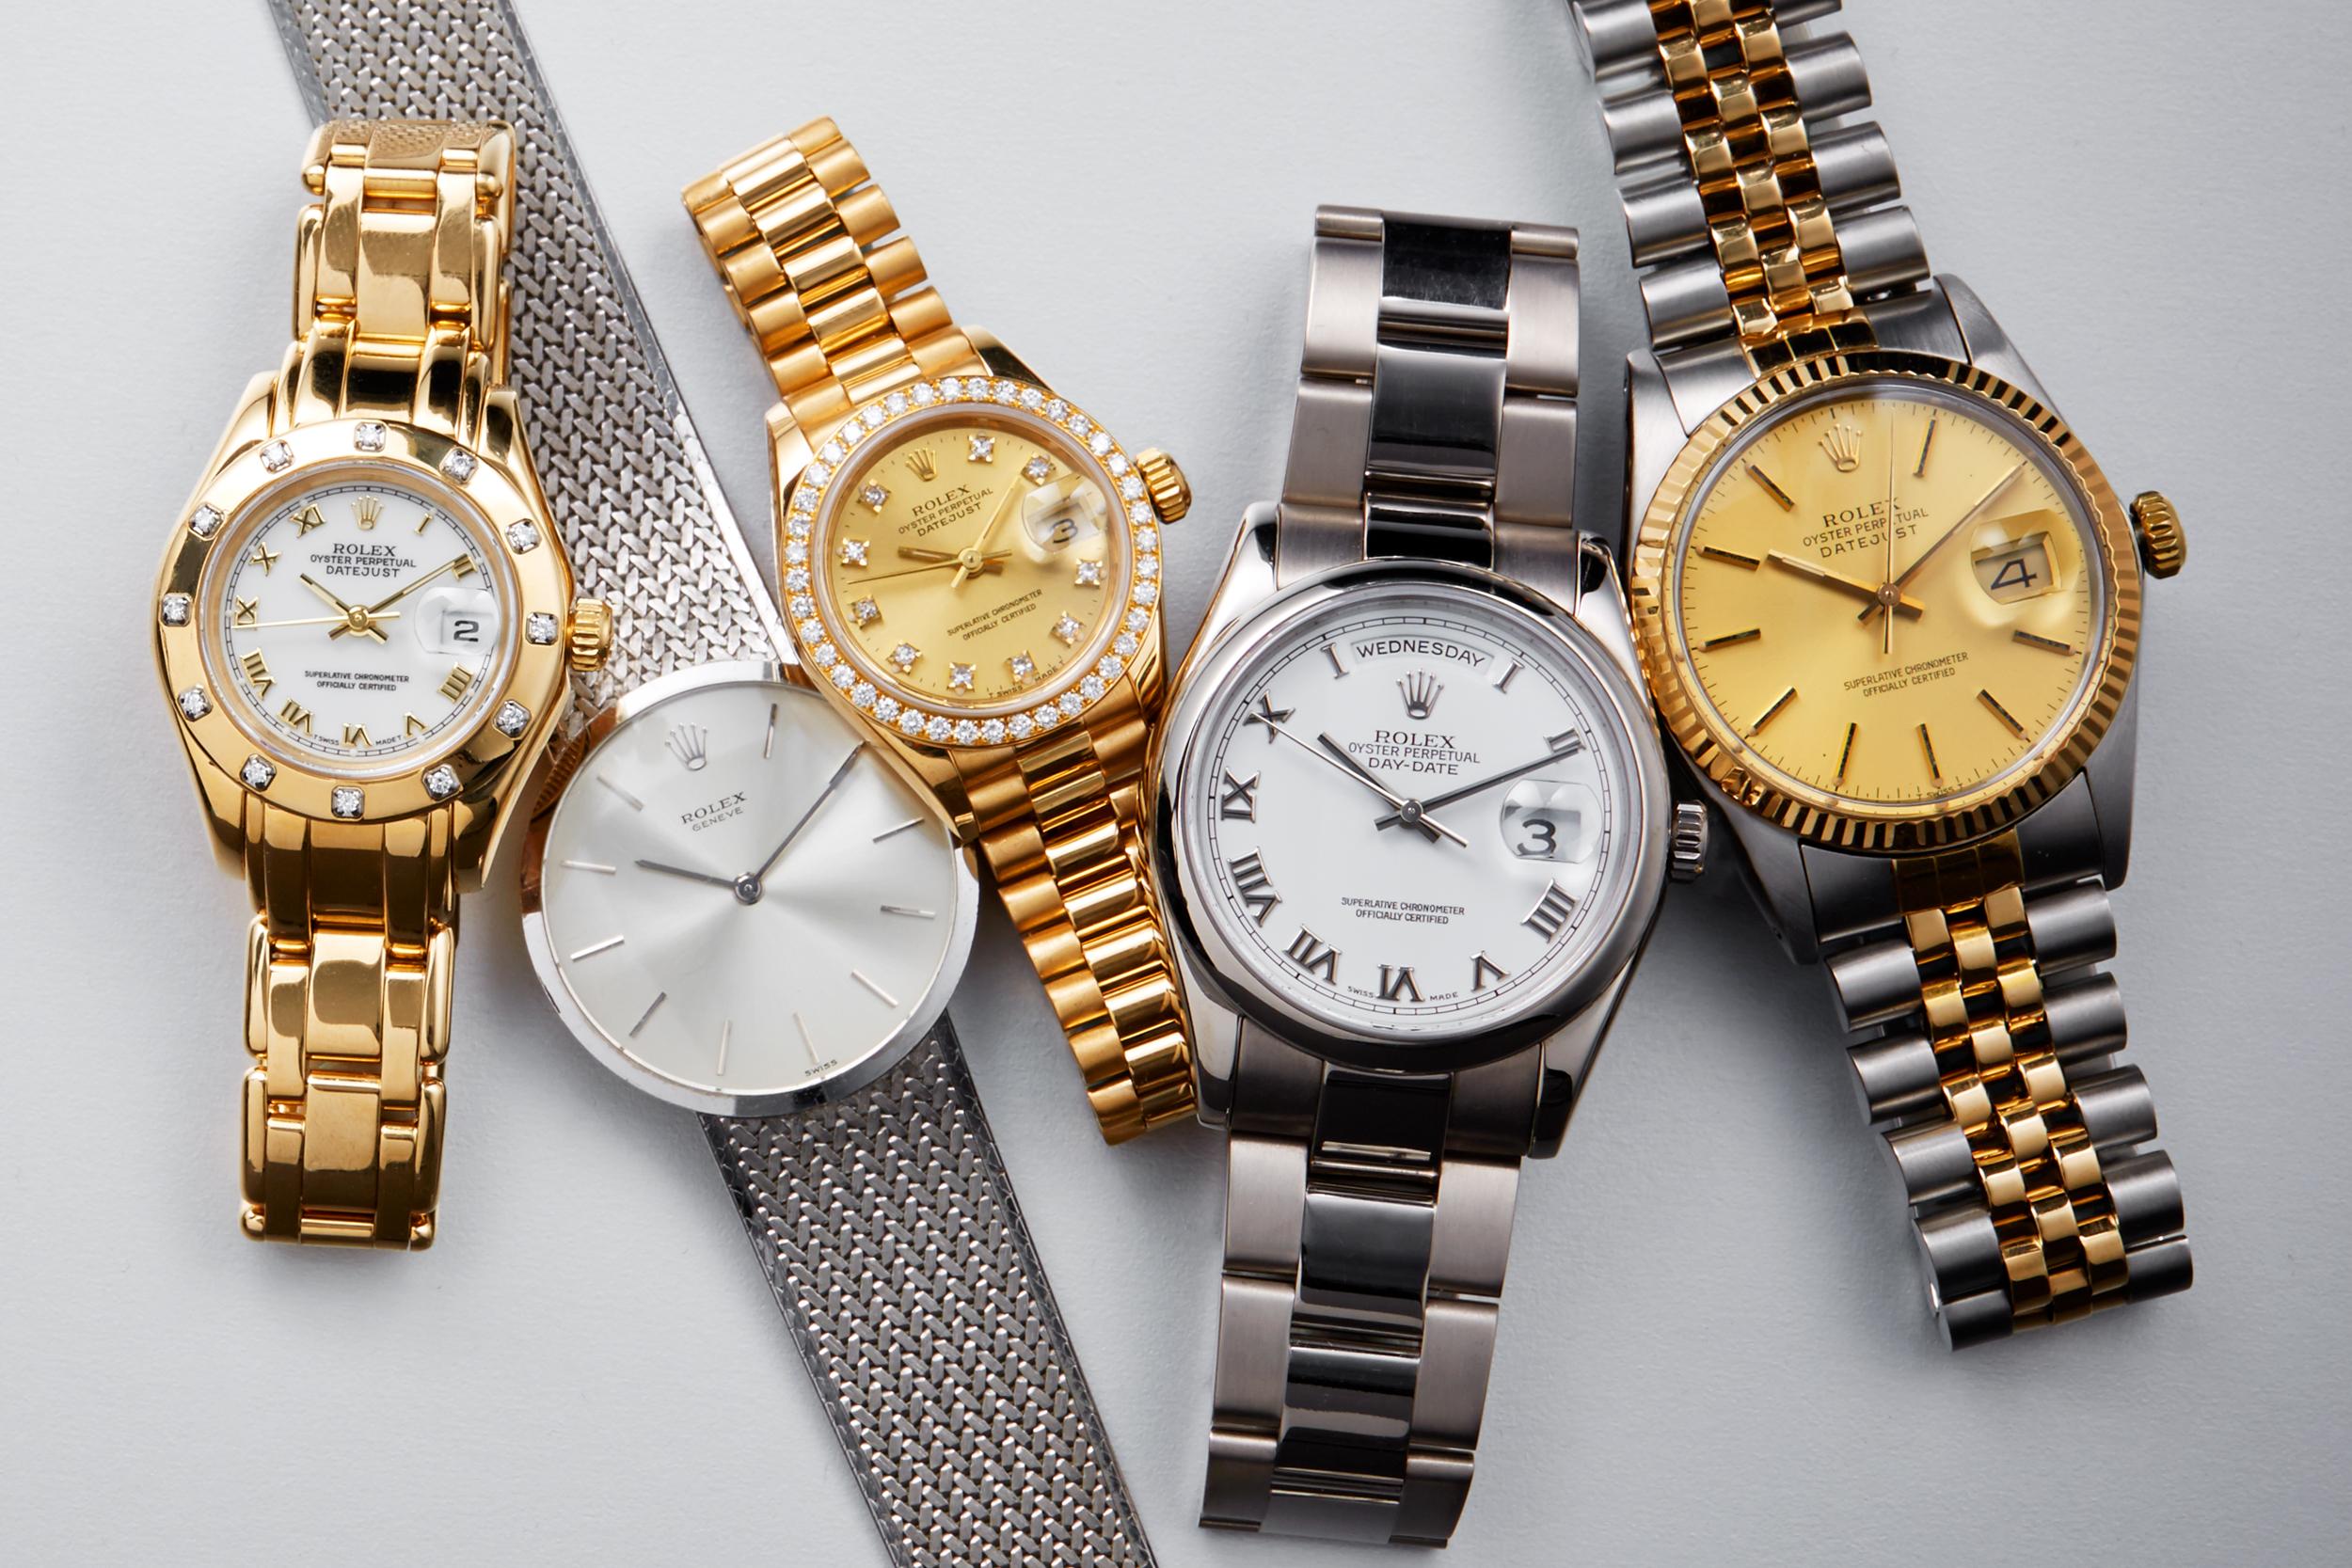 Estate_Rolex_SUPERHERO_repeat_Fine_Jewelry_1087048176_091.jpg